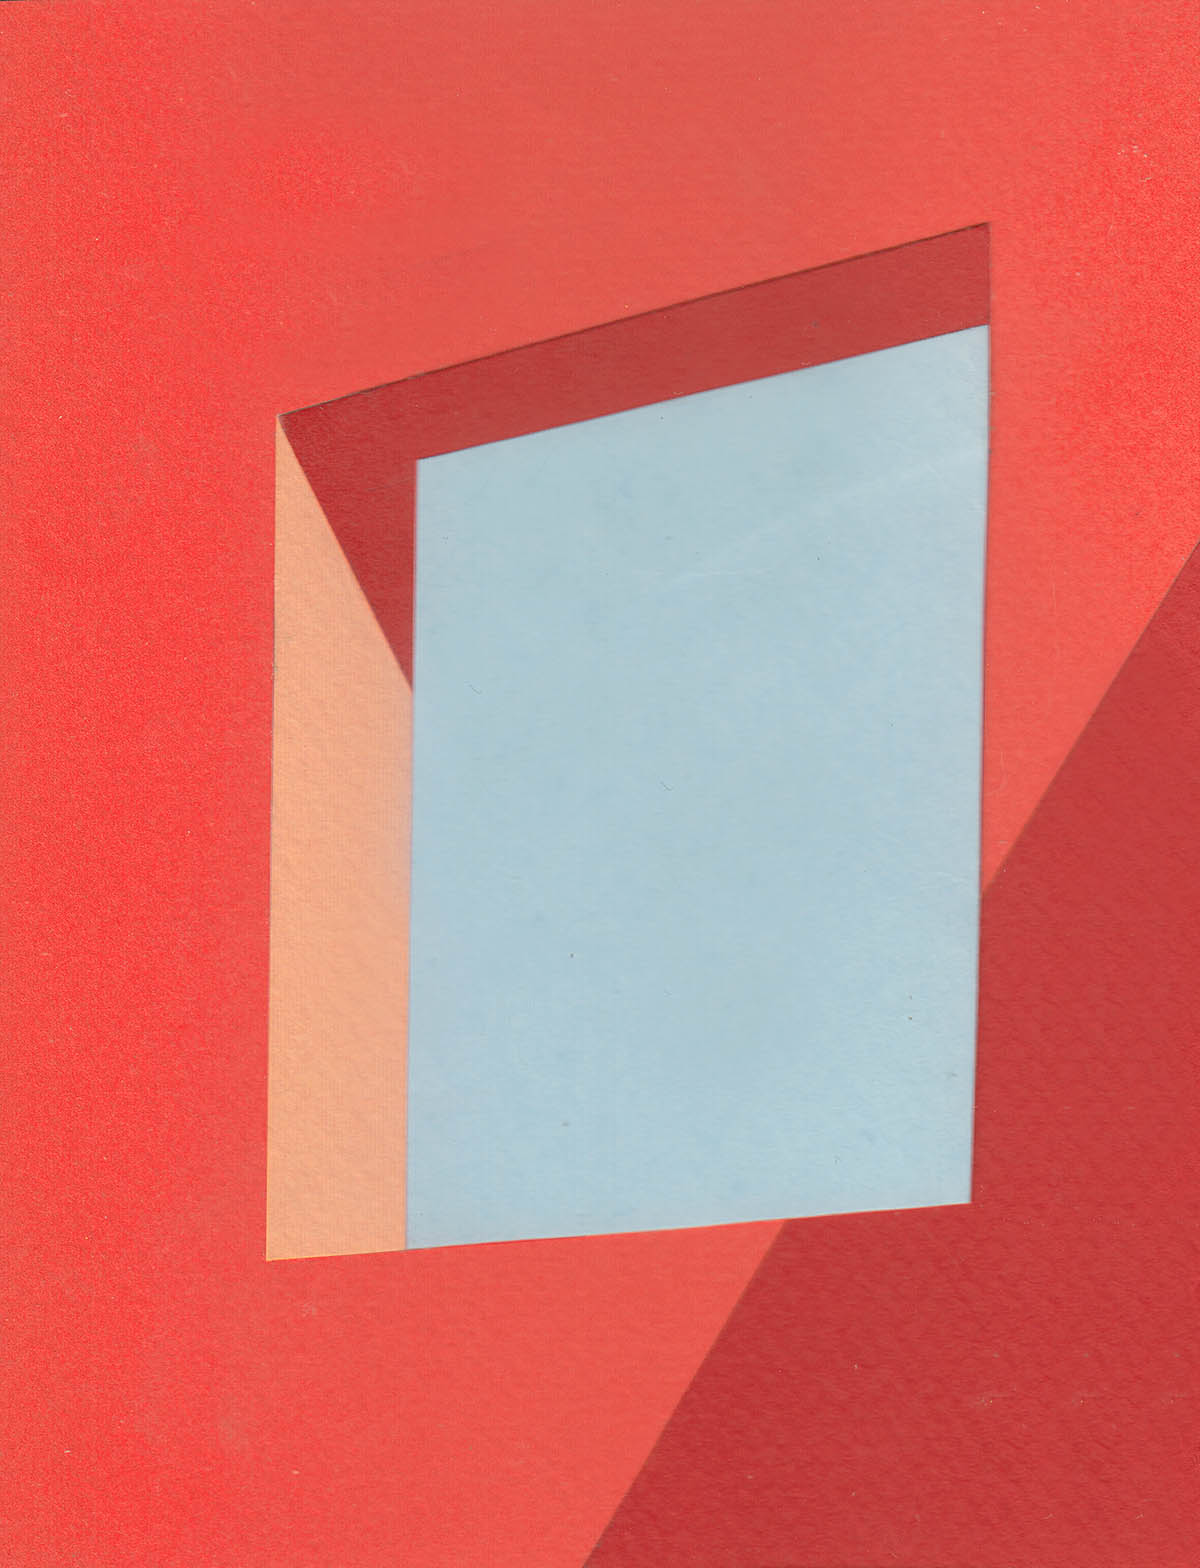 Legorreta_Window.jpg